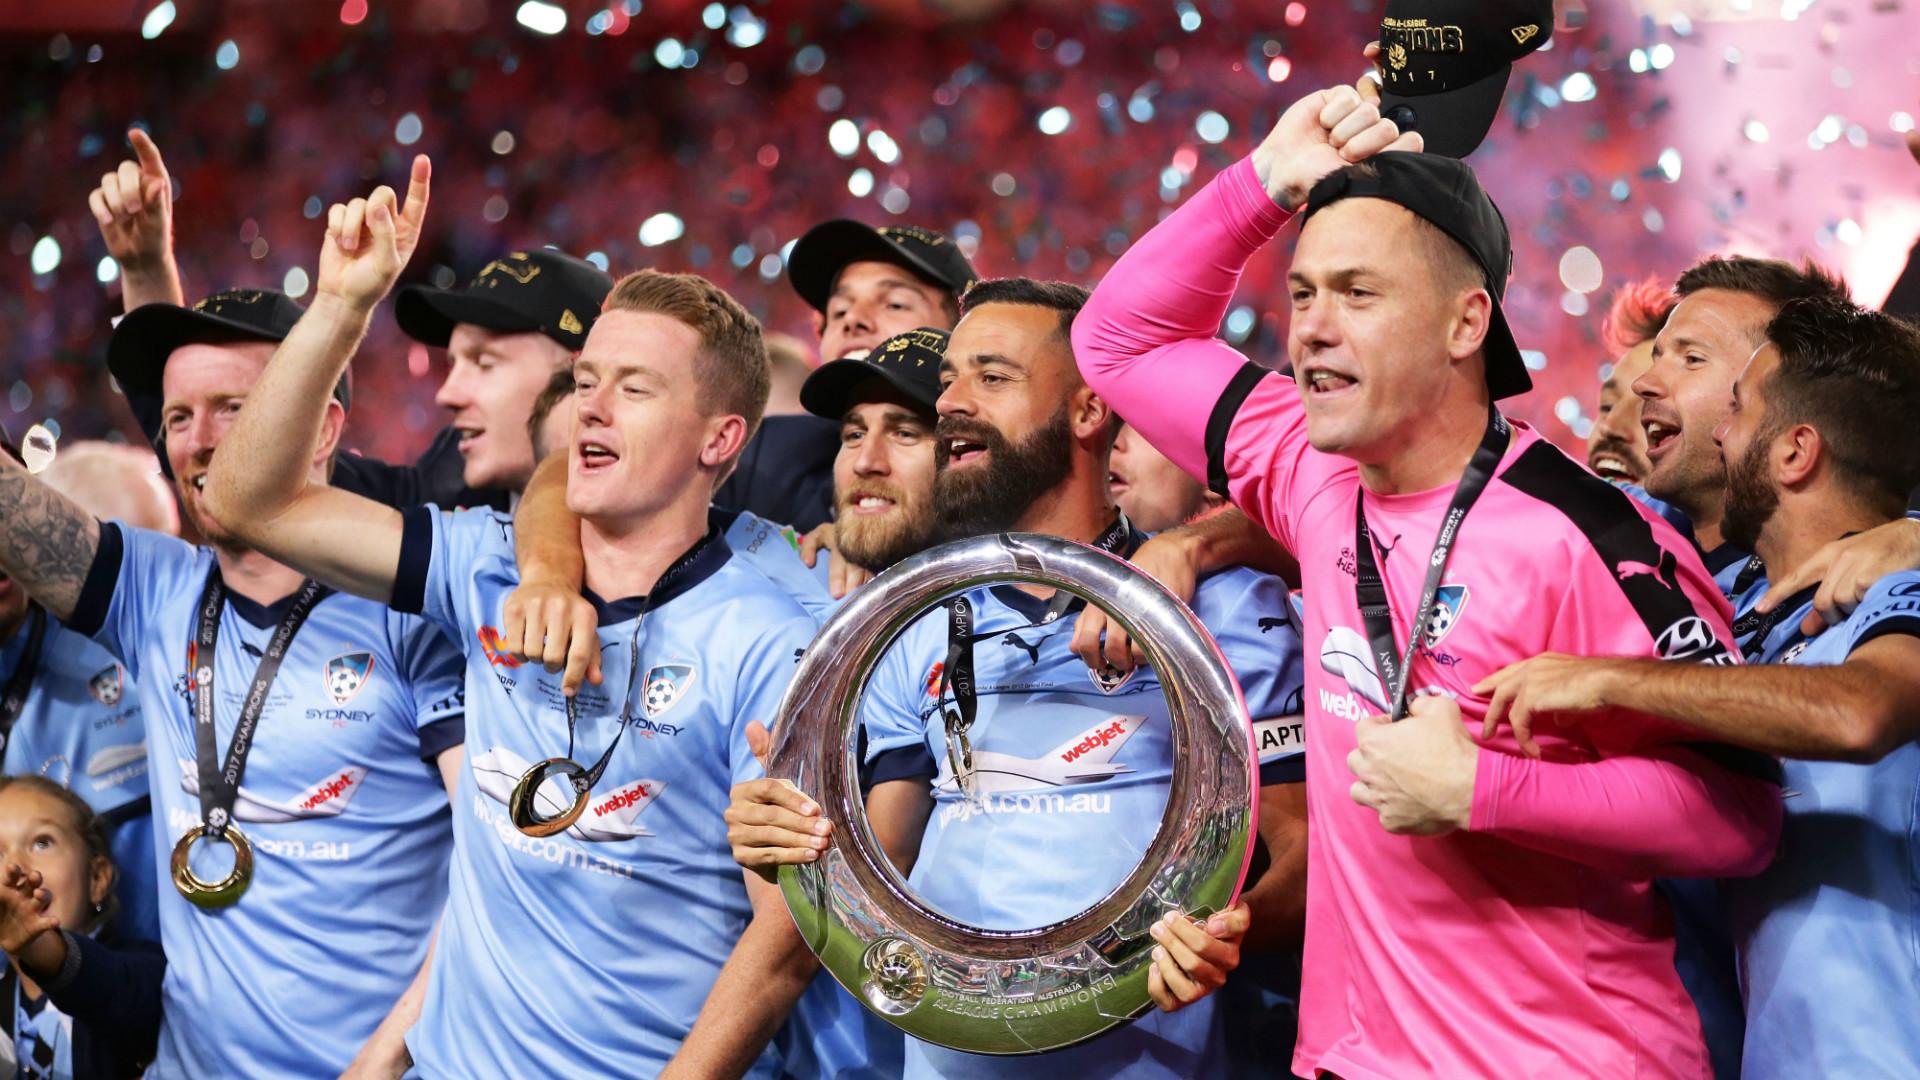 Sydney FC Grand Final